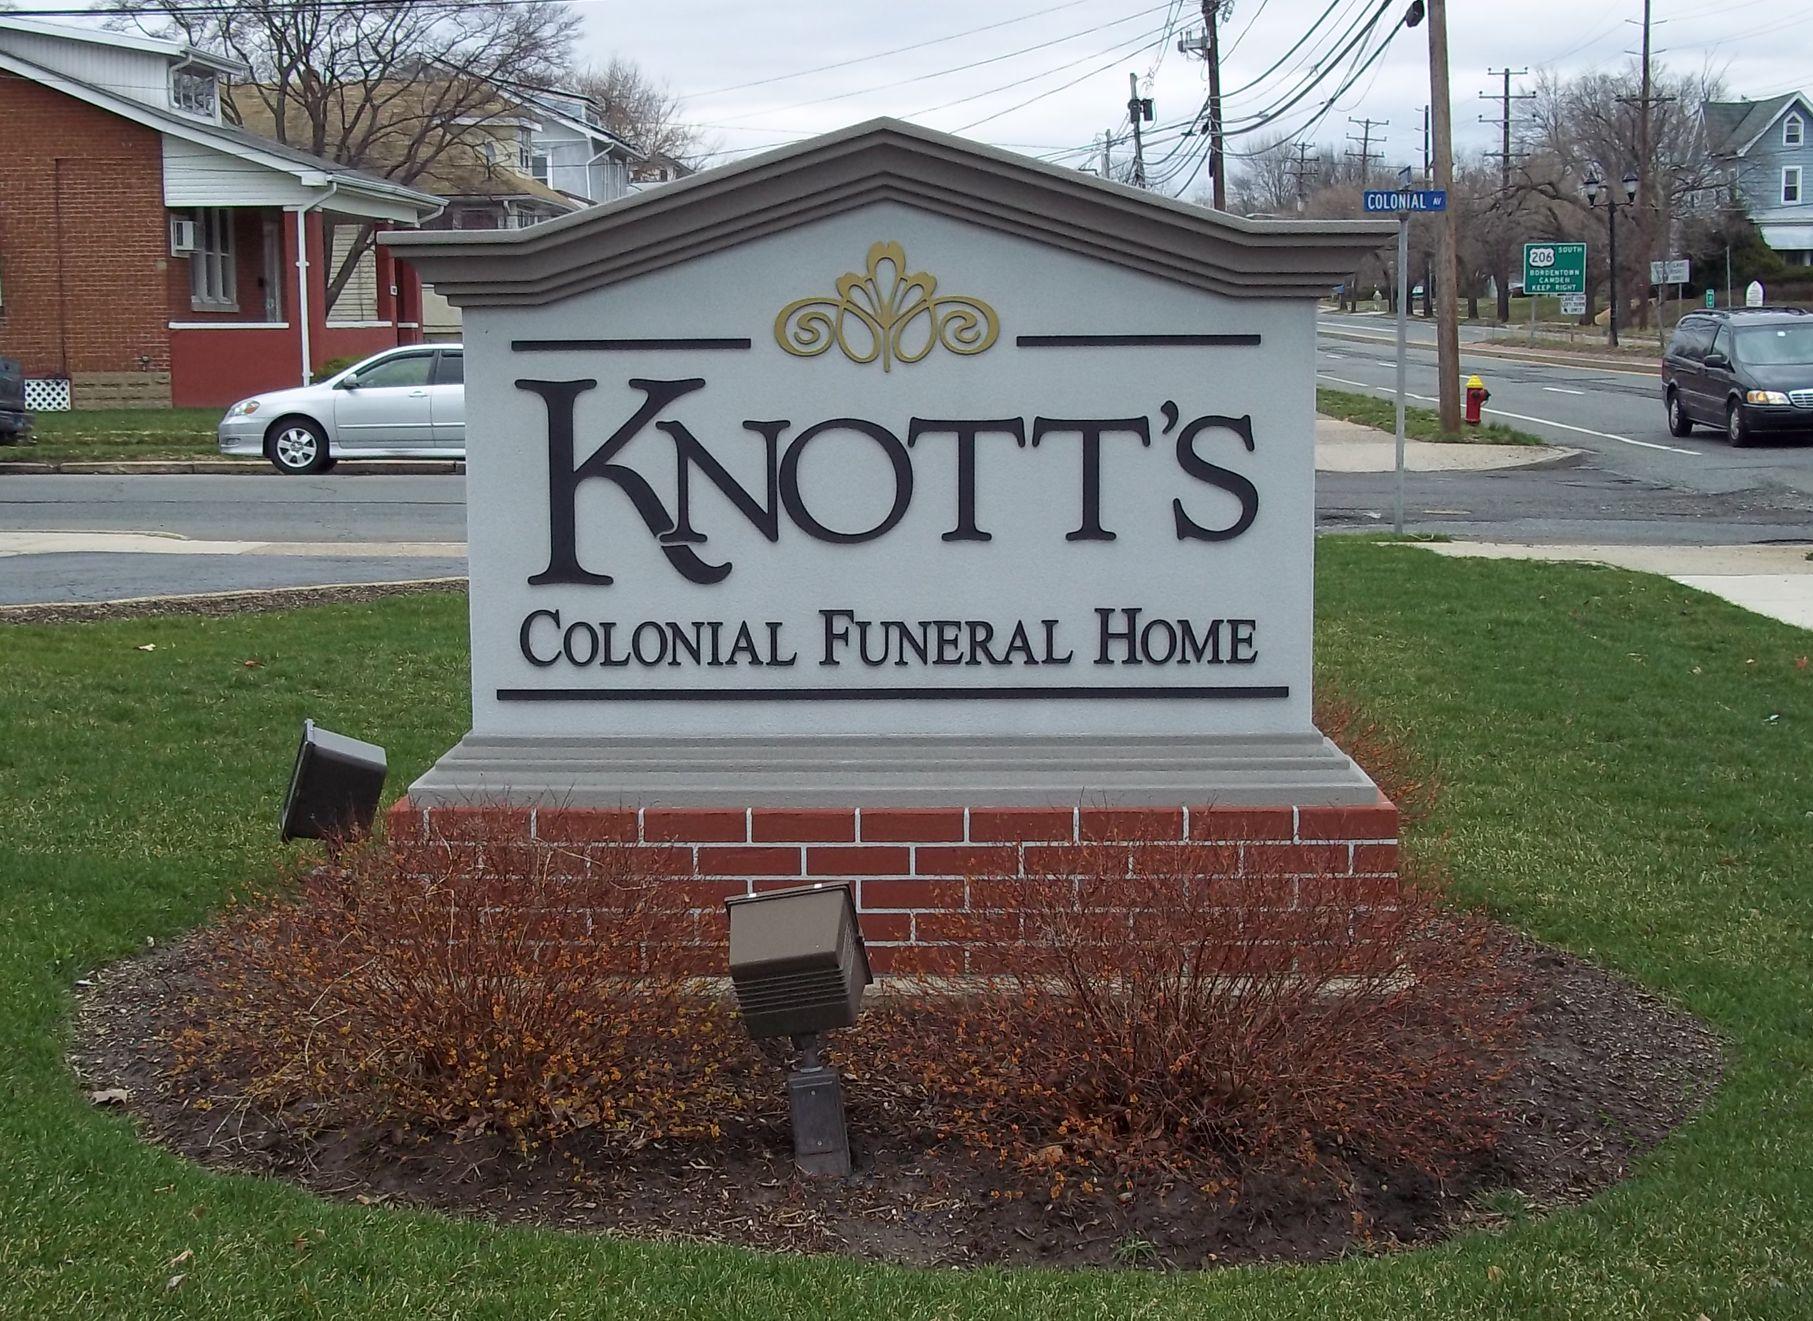 Knotts.jpg